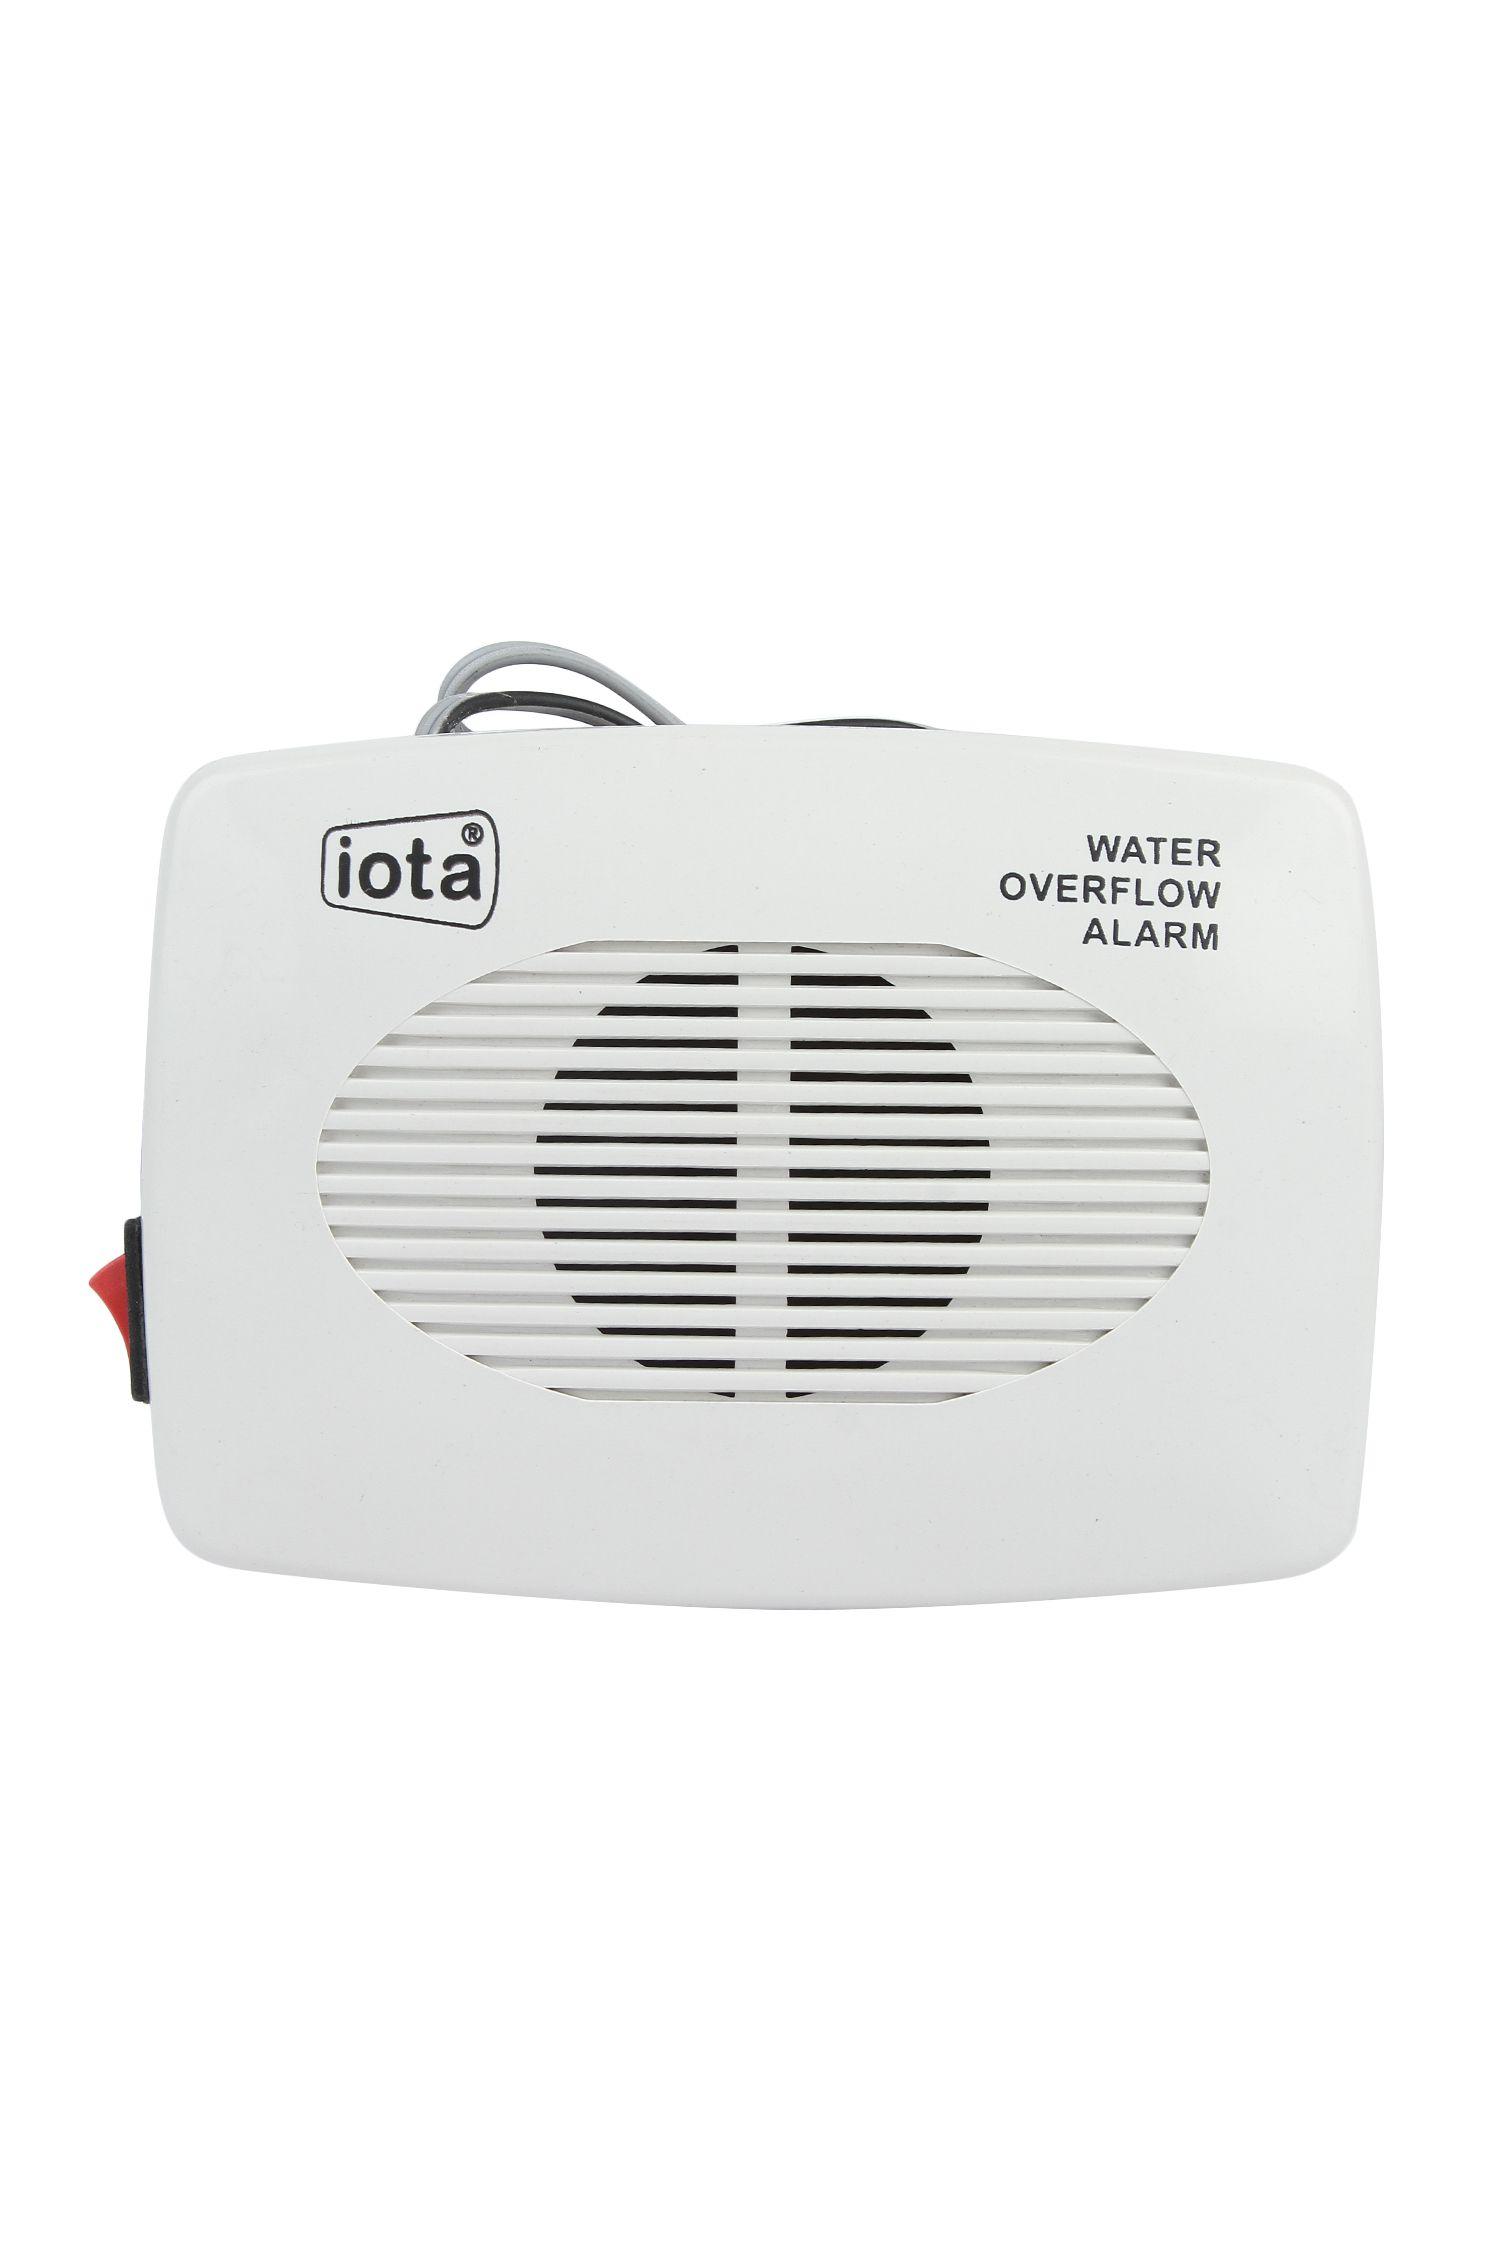 buy iota water tank overflow alarm online at low price in india